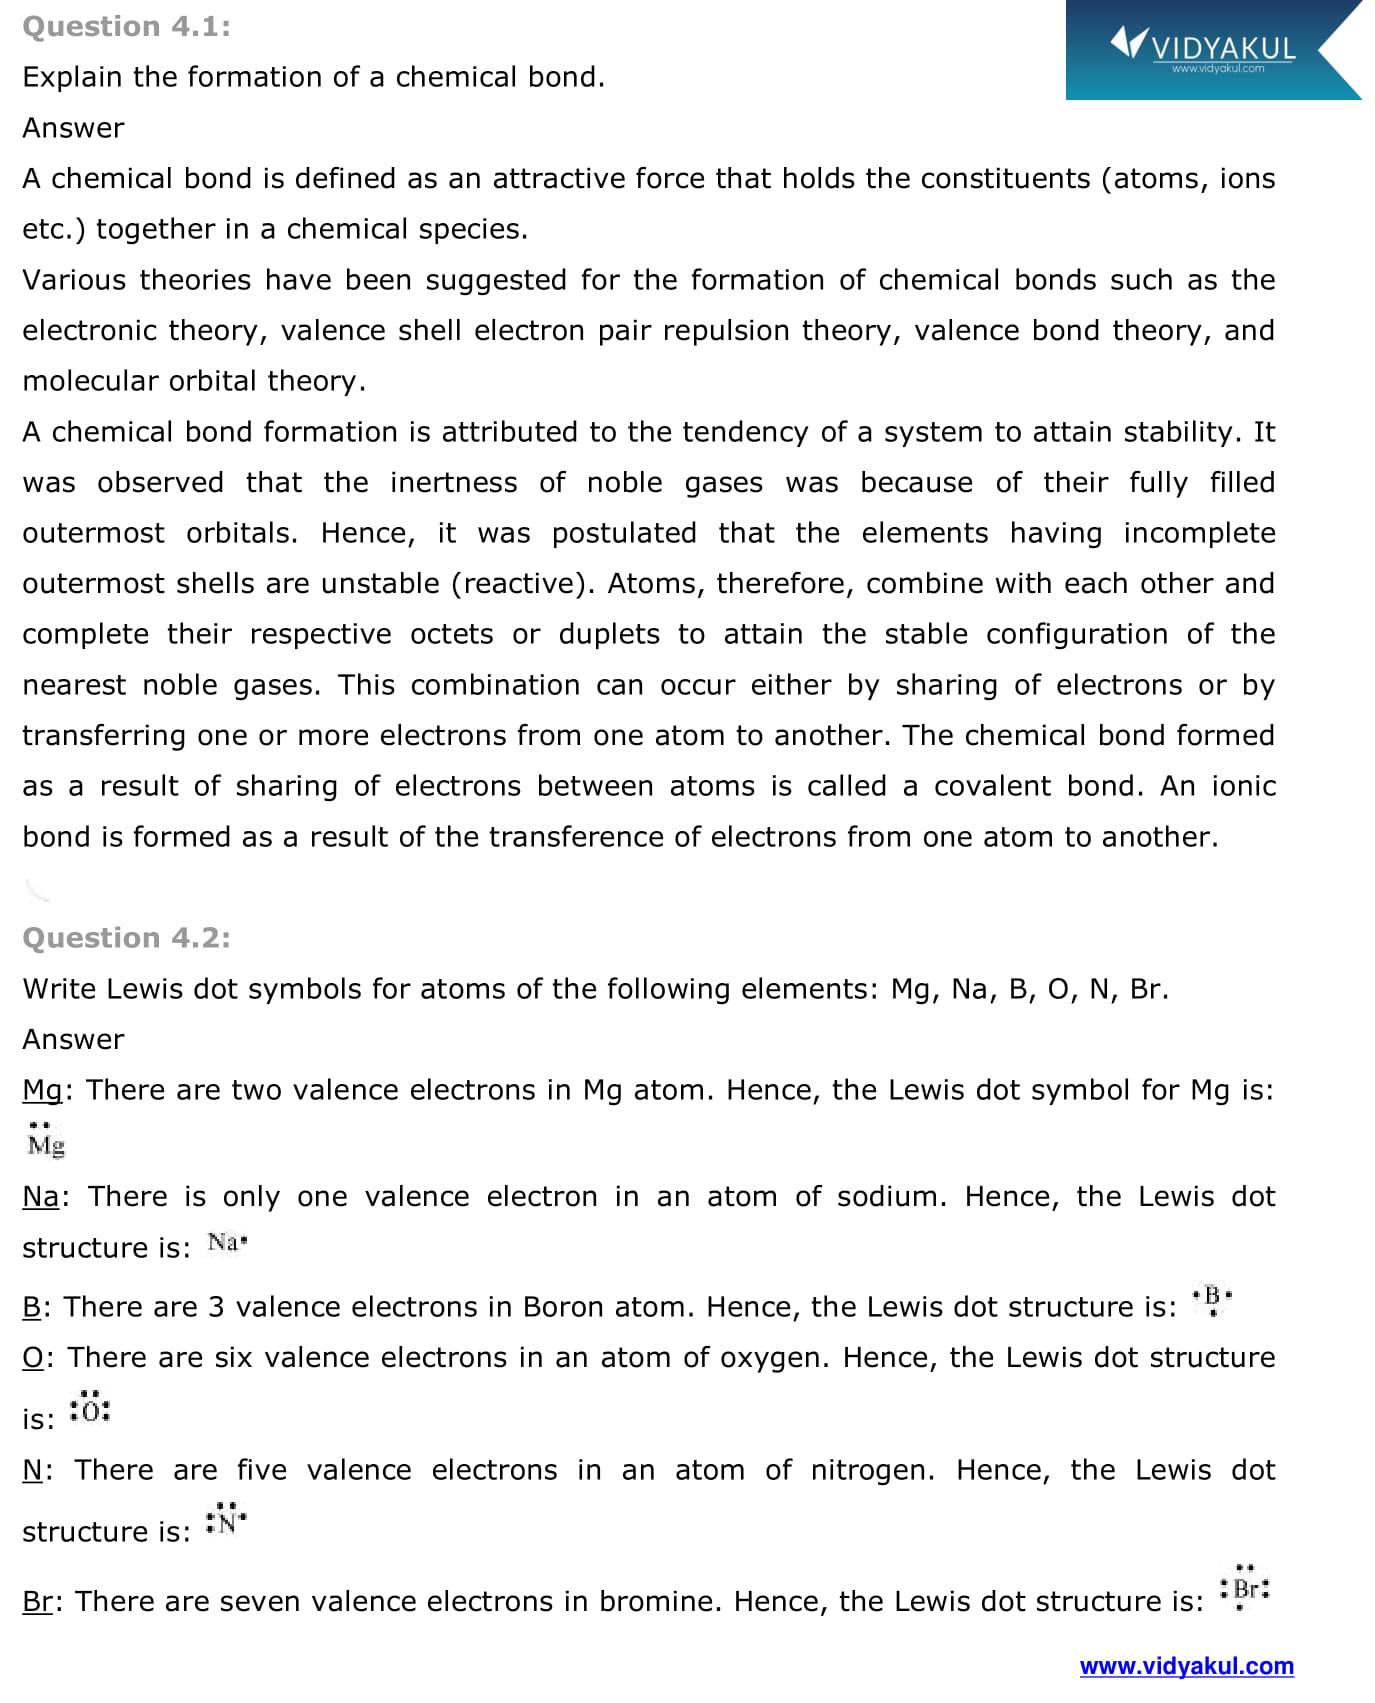 NCERT Solutions Class 11 Chemistry Chapter 4   Vidyakul